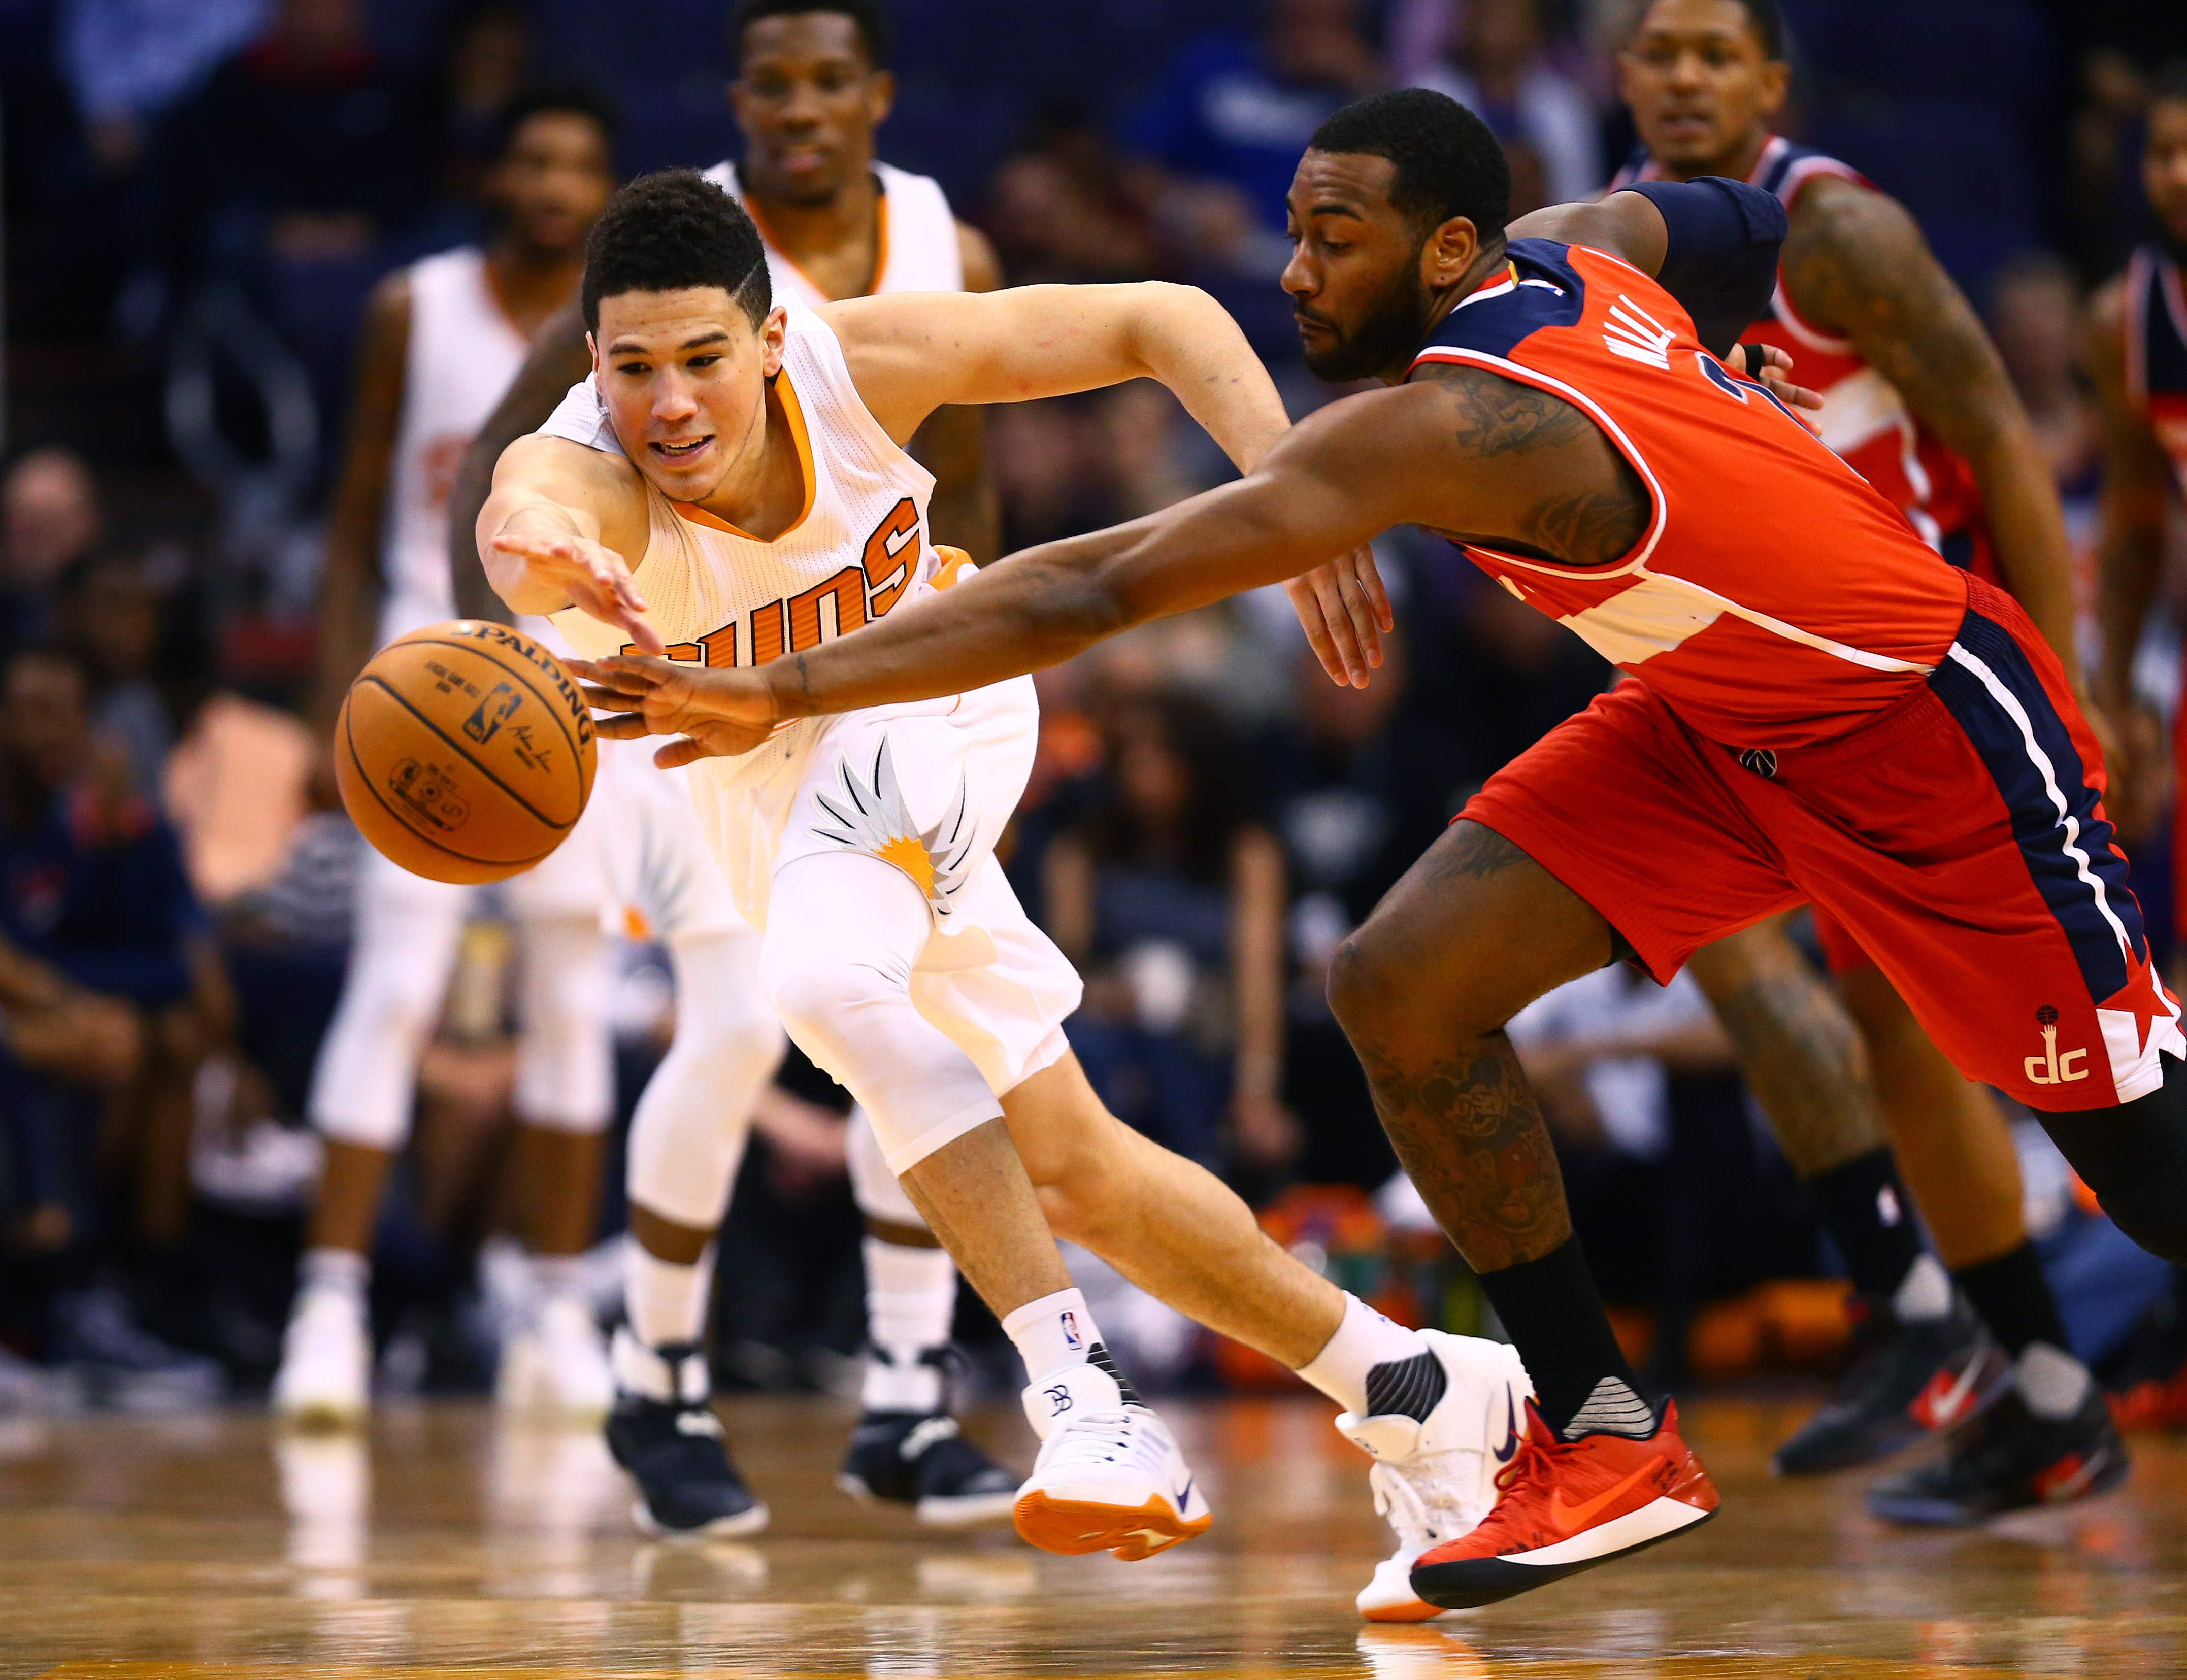 Nba Finals Who Plays Tonight | Basketball Scores